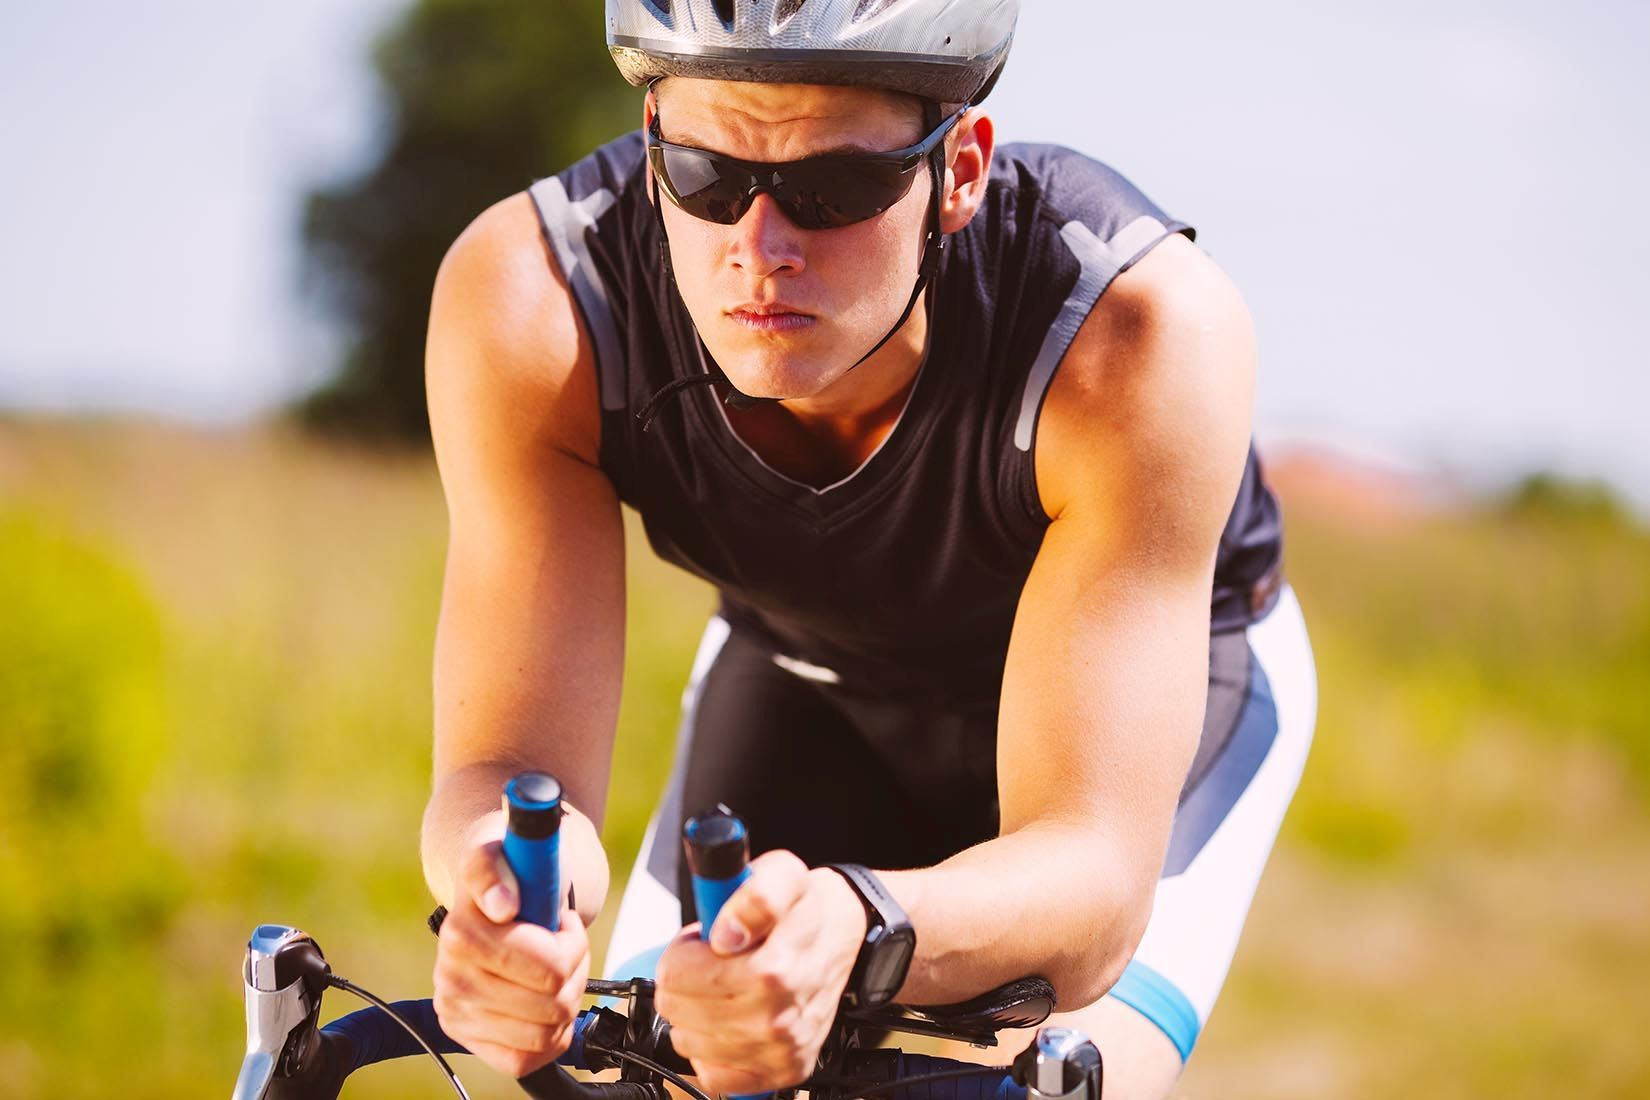 Sworke sunglasses: outdoor biking 05 1650x1100